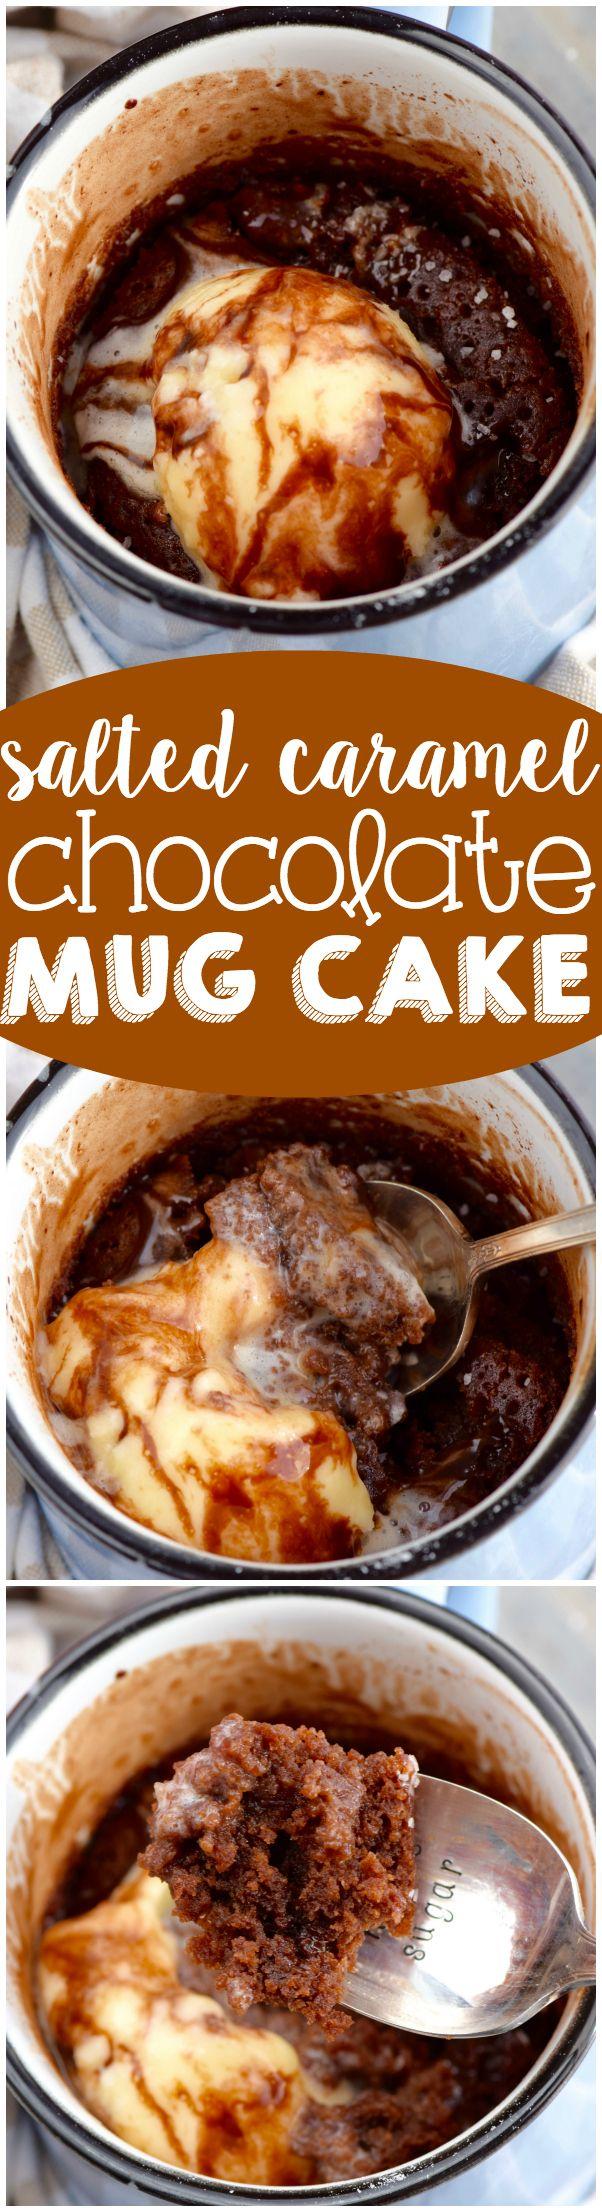 Best 10+ Chocolate mugs ideas on Pinterest | Chocolate mug cakes ...